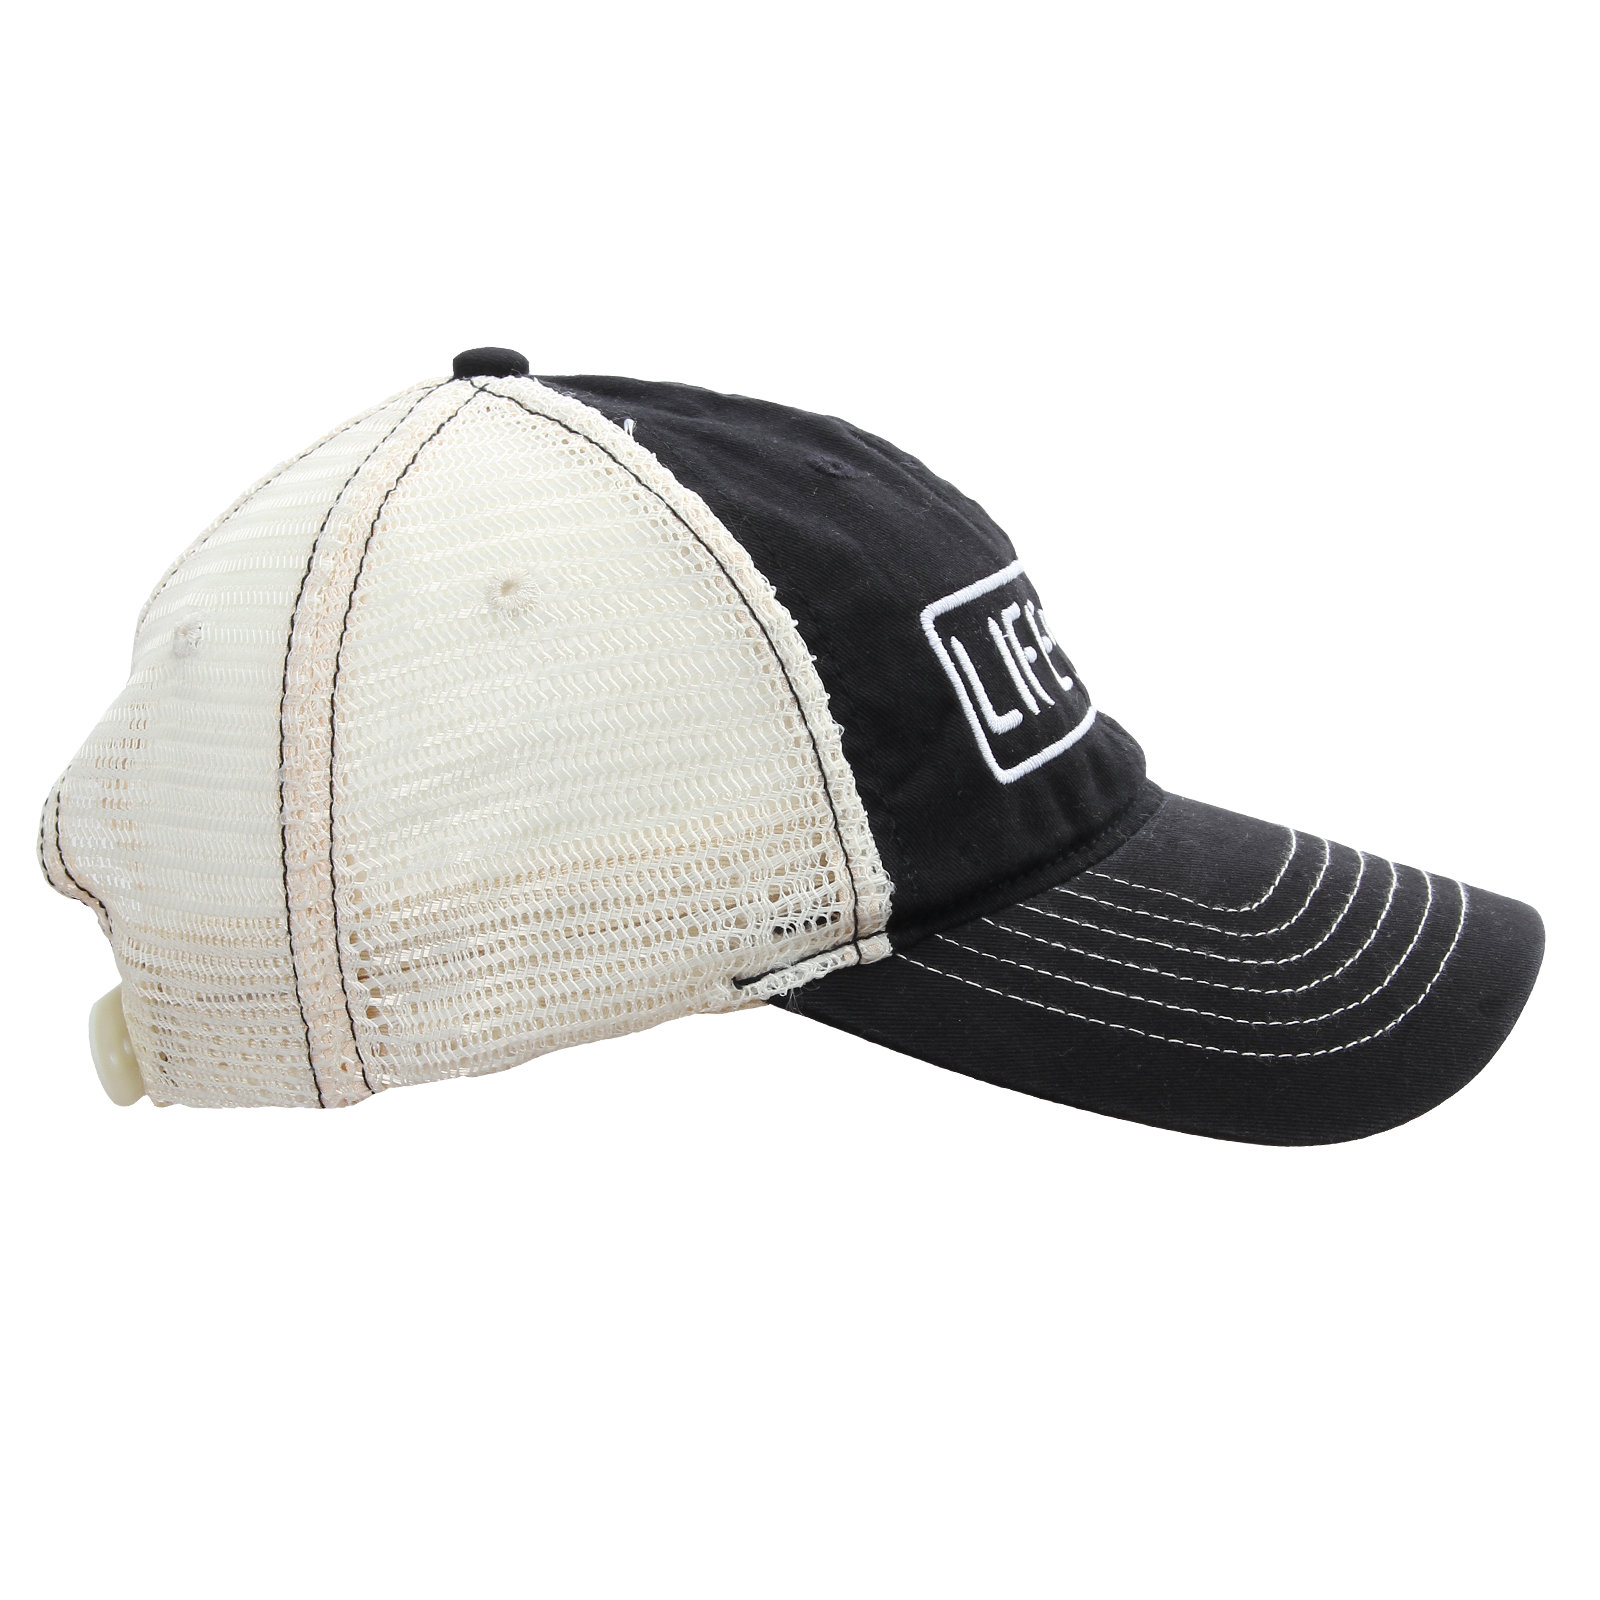 Life of Dad Store - Life of Dad on Black Trucker Hat 22c21edd65f